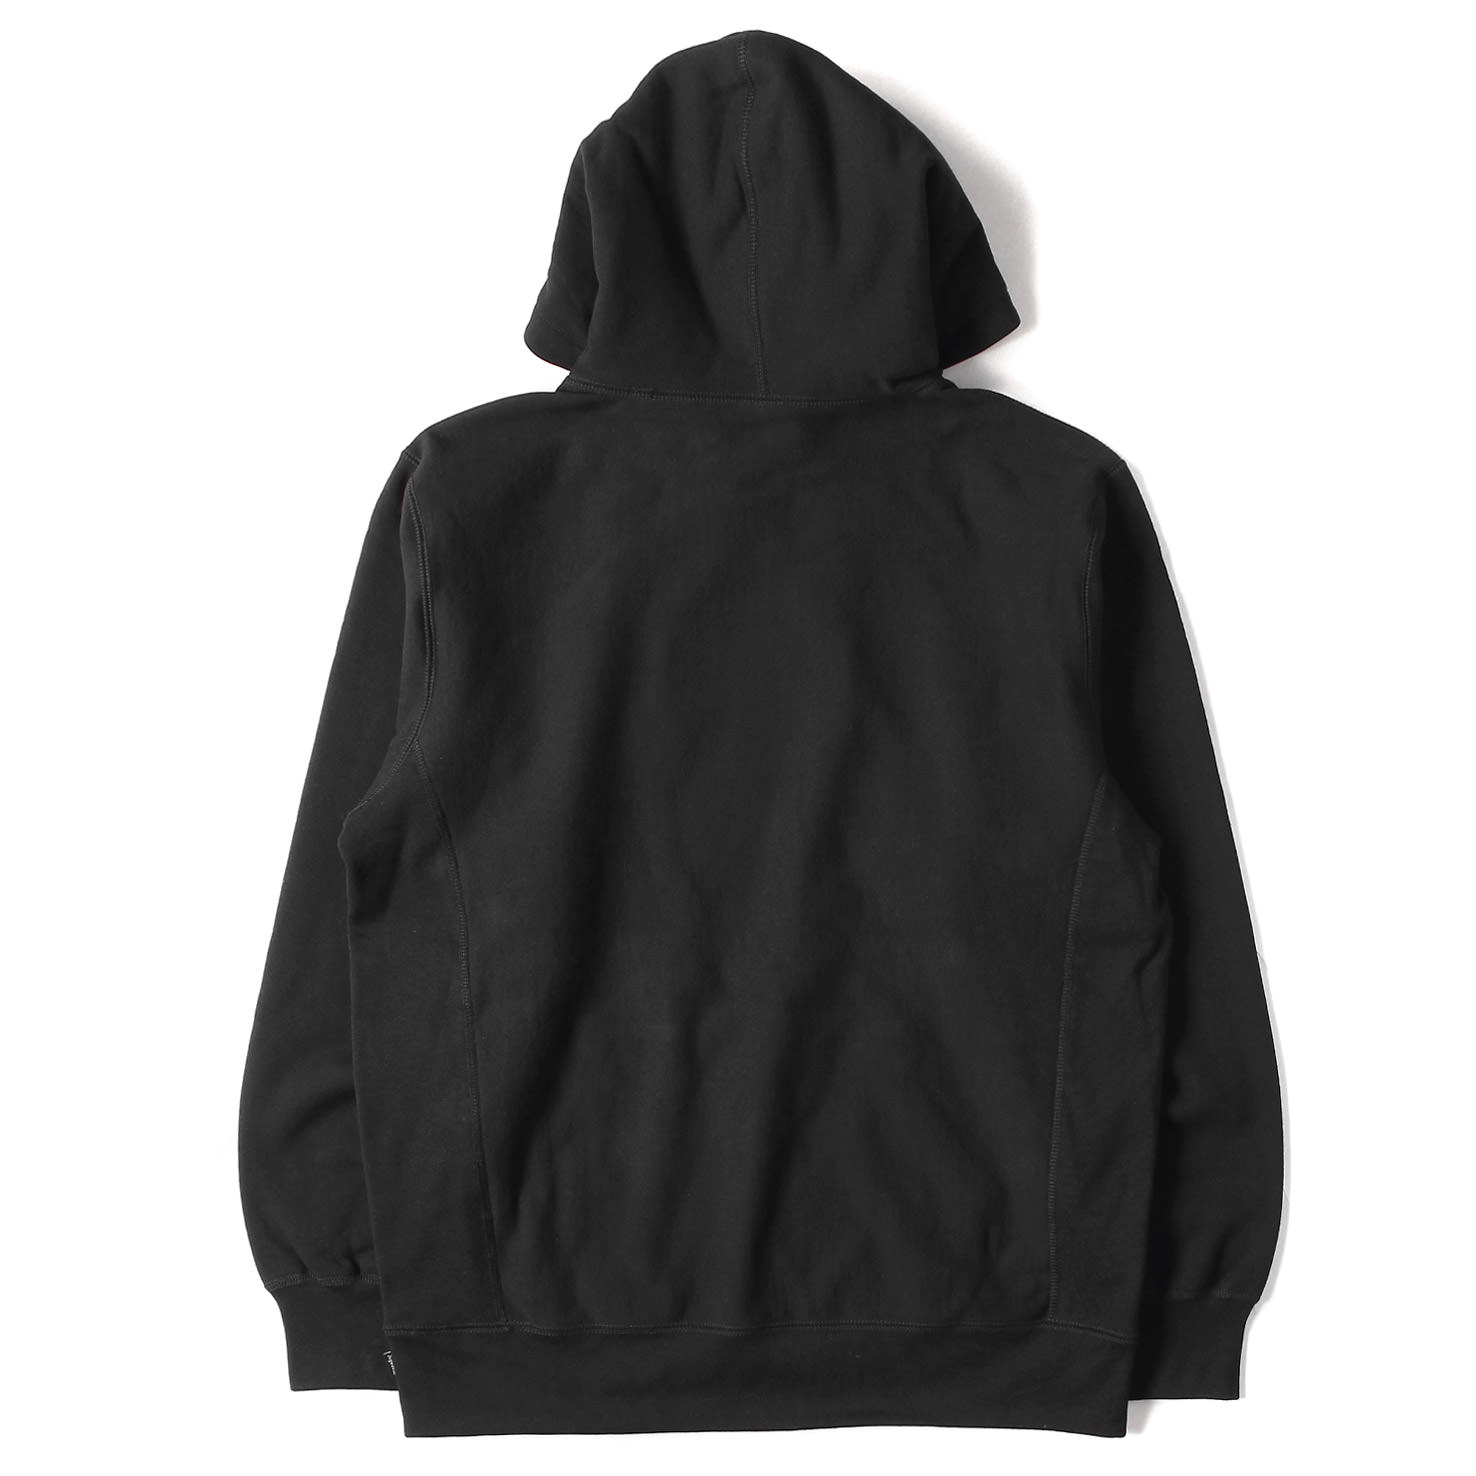 Mens Hooded Sweatshirt Sam Smith Logo Unique Classic Fashion Style Gray